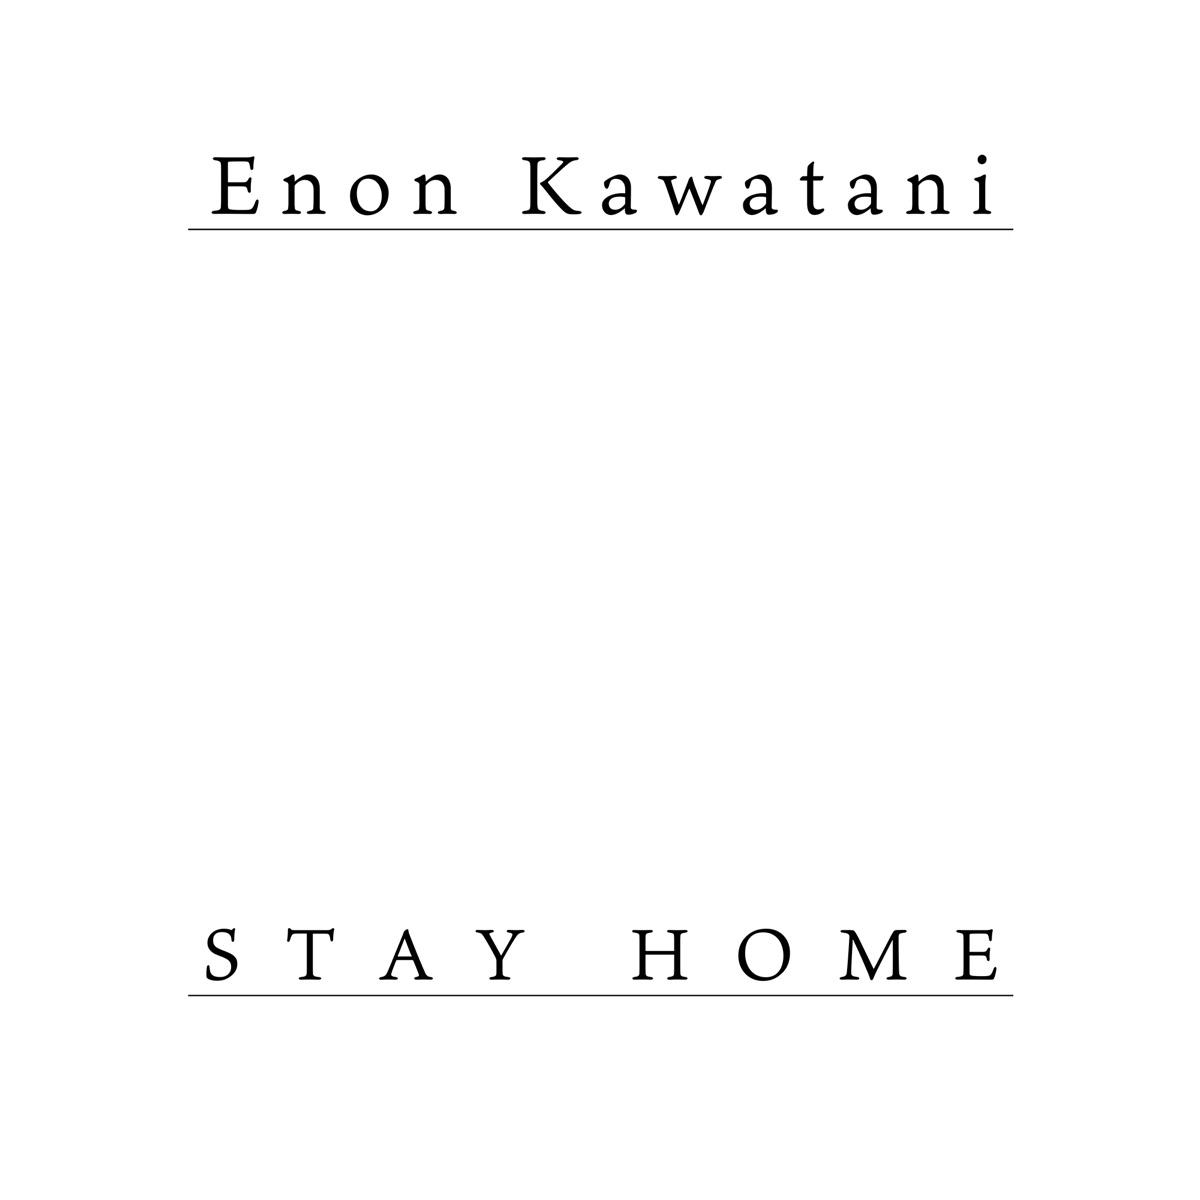 『Enon Kawatani - STAY HOME』収録の『STAY HOME』ジャケット